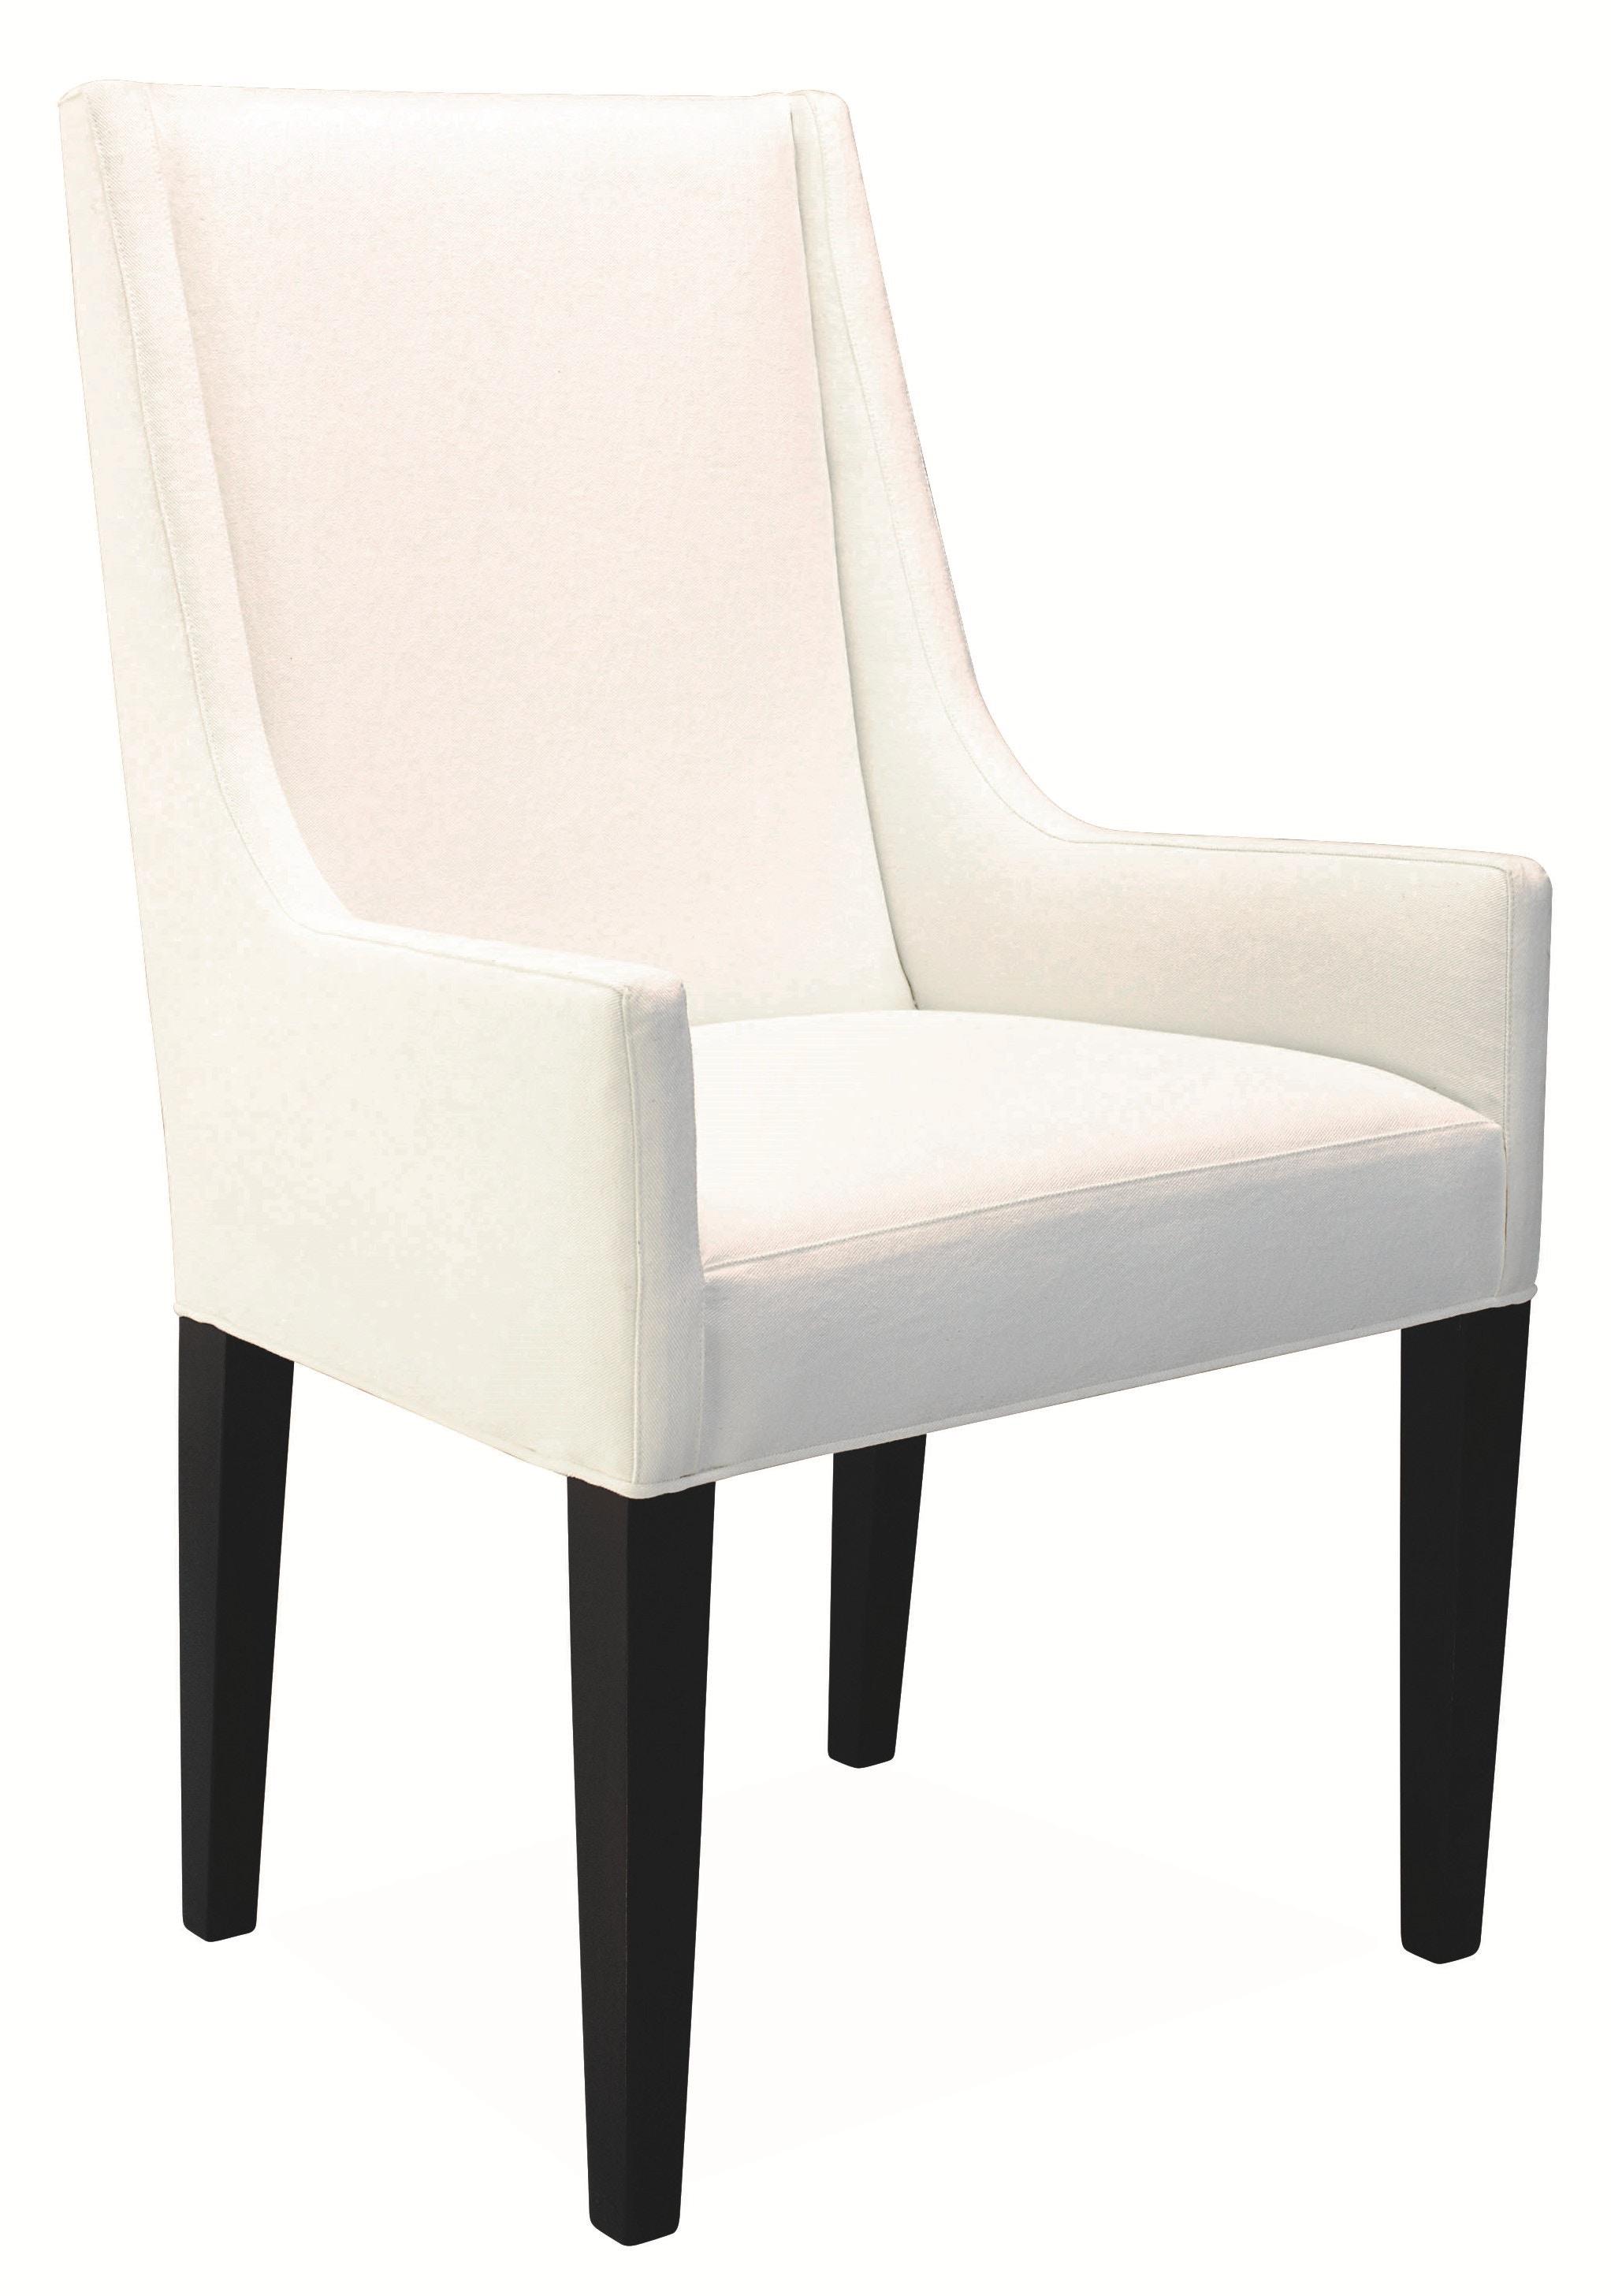 Spokane WA Furniture Store